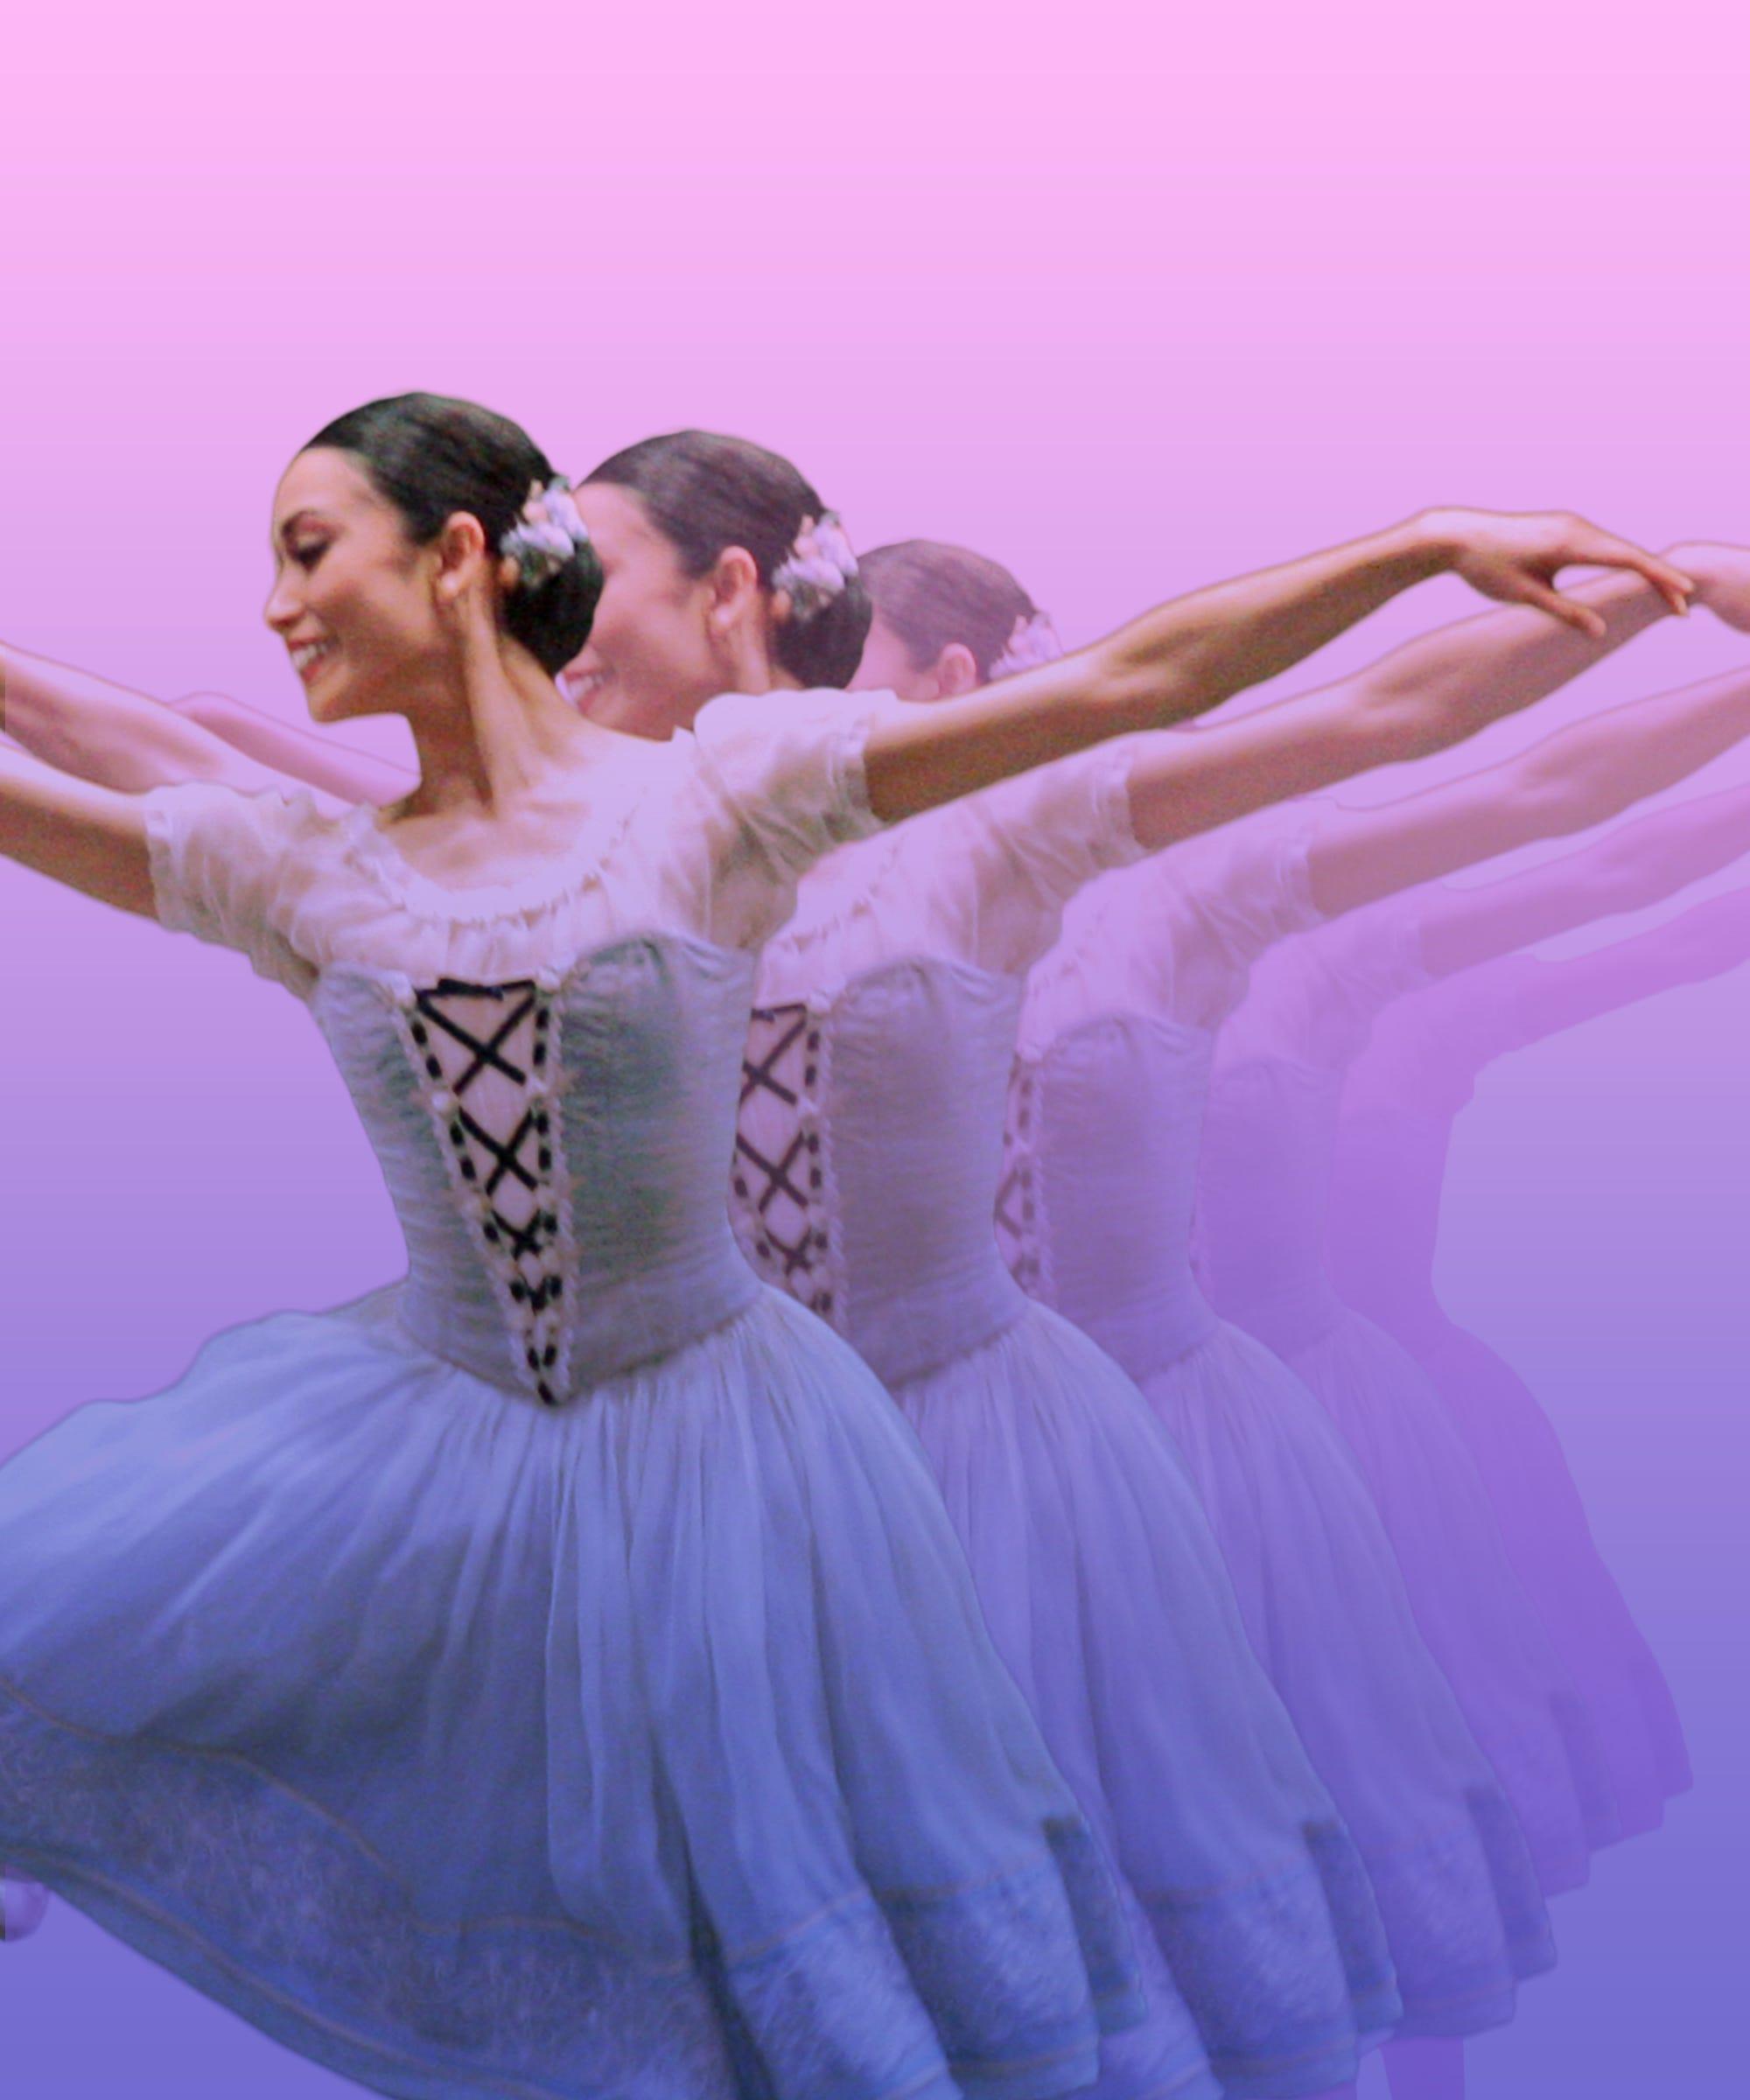 How Ballerina Stella Abrera Lives With No Regrets